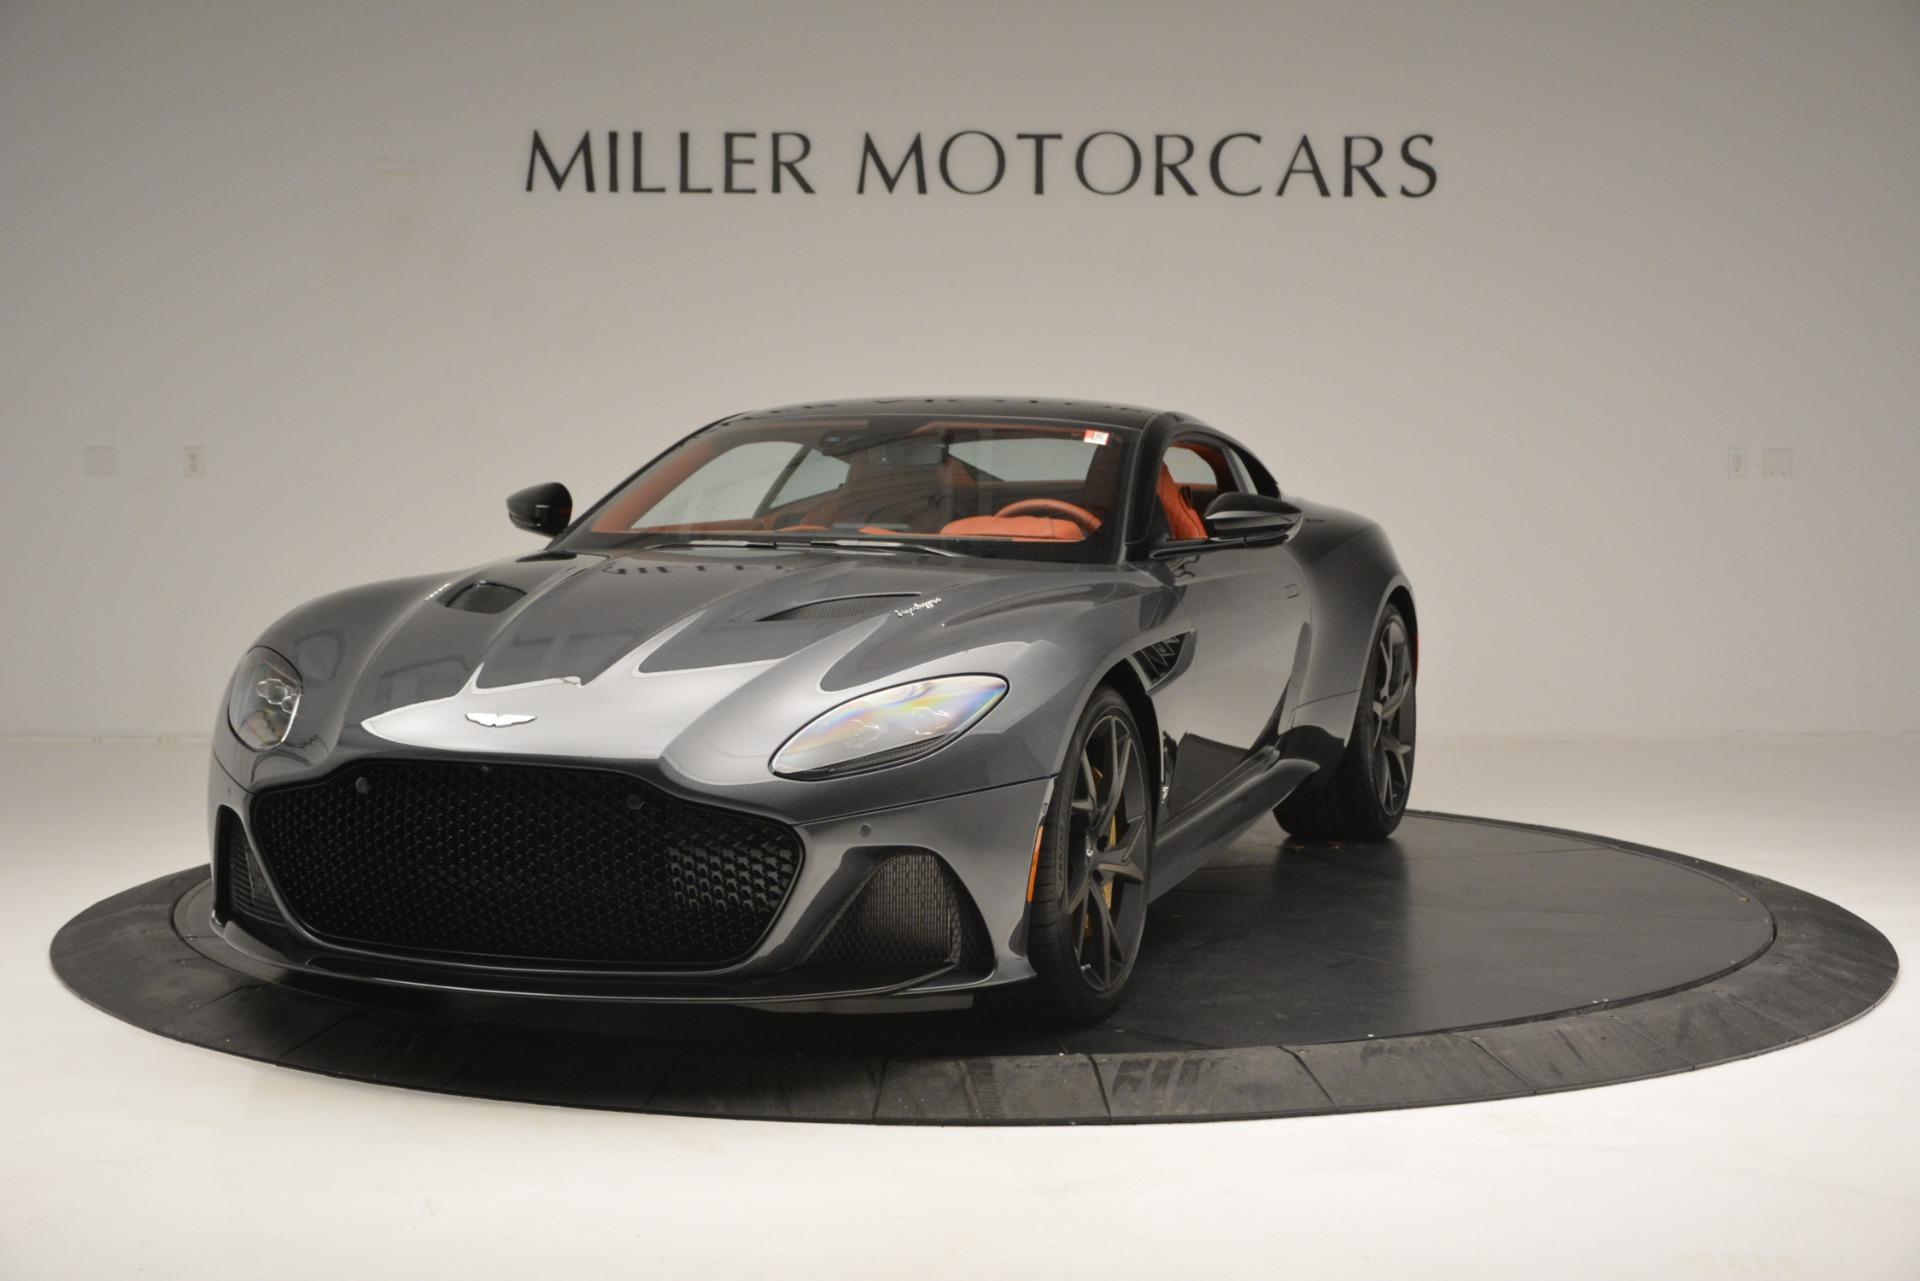 New 2019 Aston Martin DBS Superleggera For Sale 360711 In Greenwich, CT